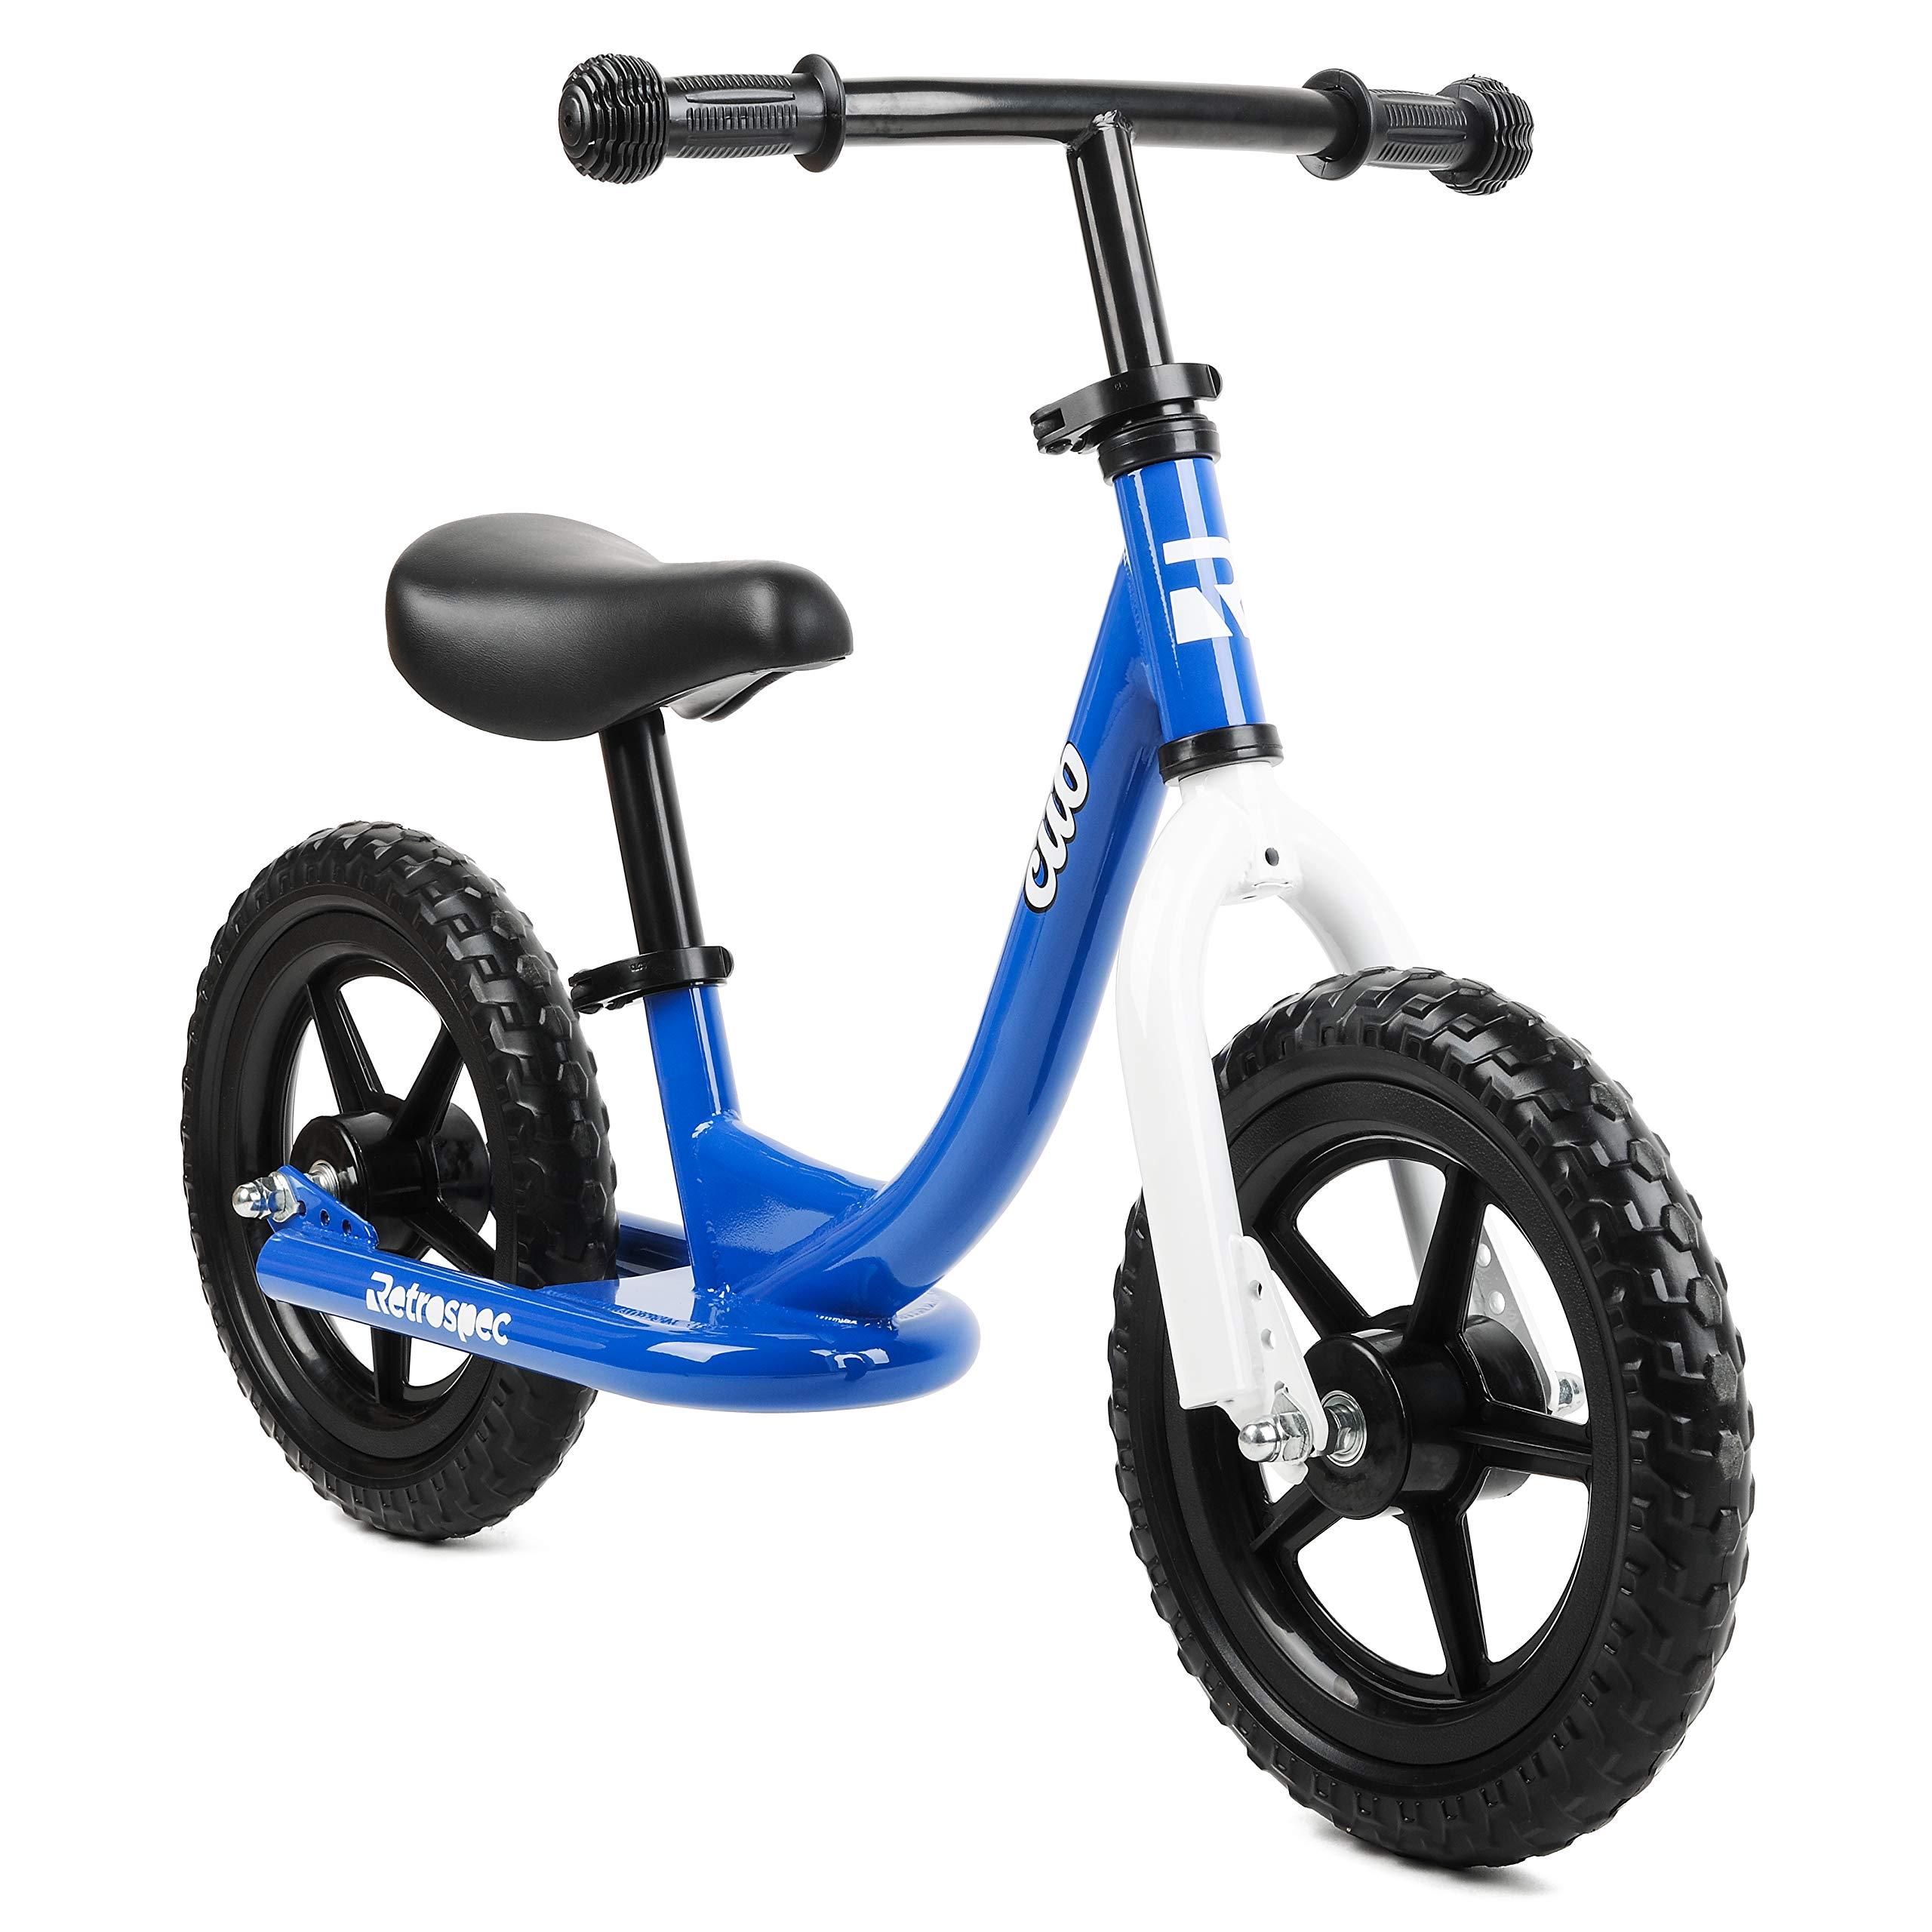 Retrospec Cub Kids Balance Bike No Pedal Bicycle product image